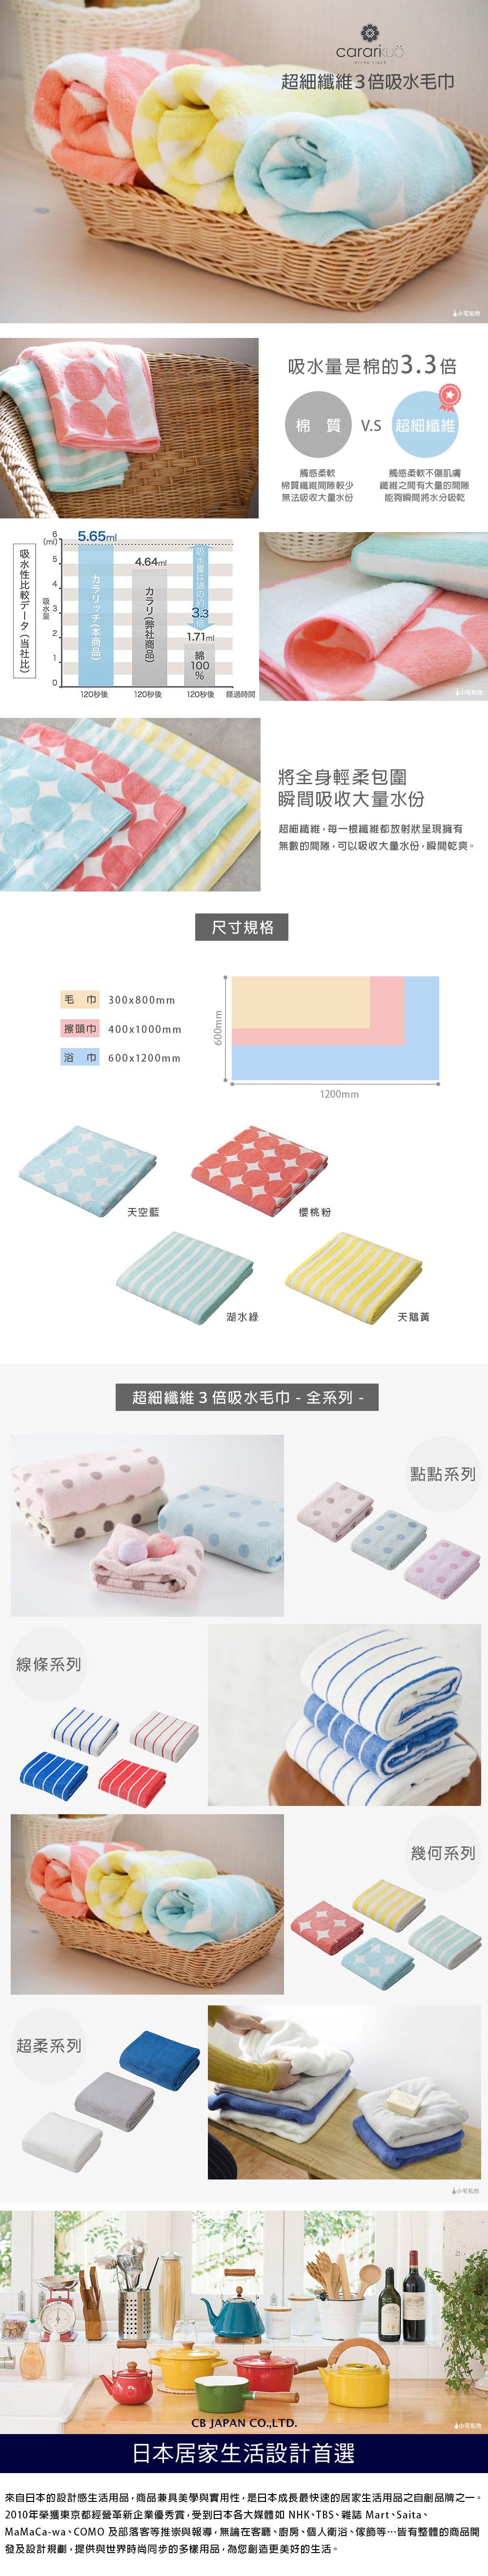 CB Japan 泡泡糖 幾何系列 超細纖維3倍吸水浴巾 - 湖水綠